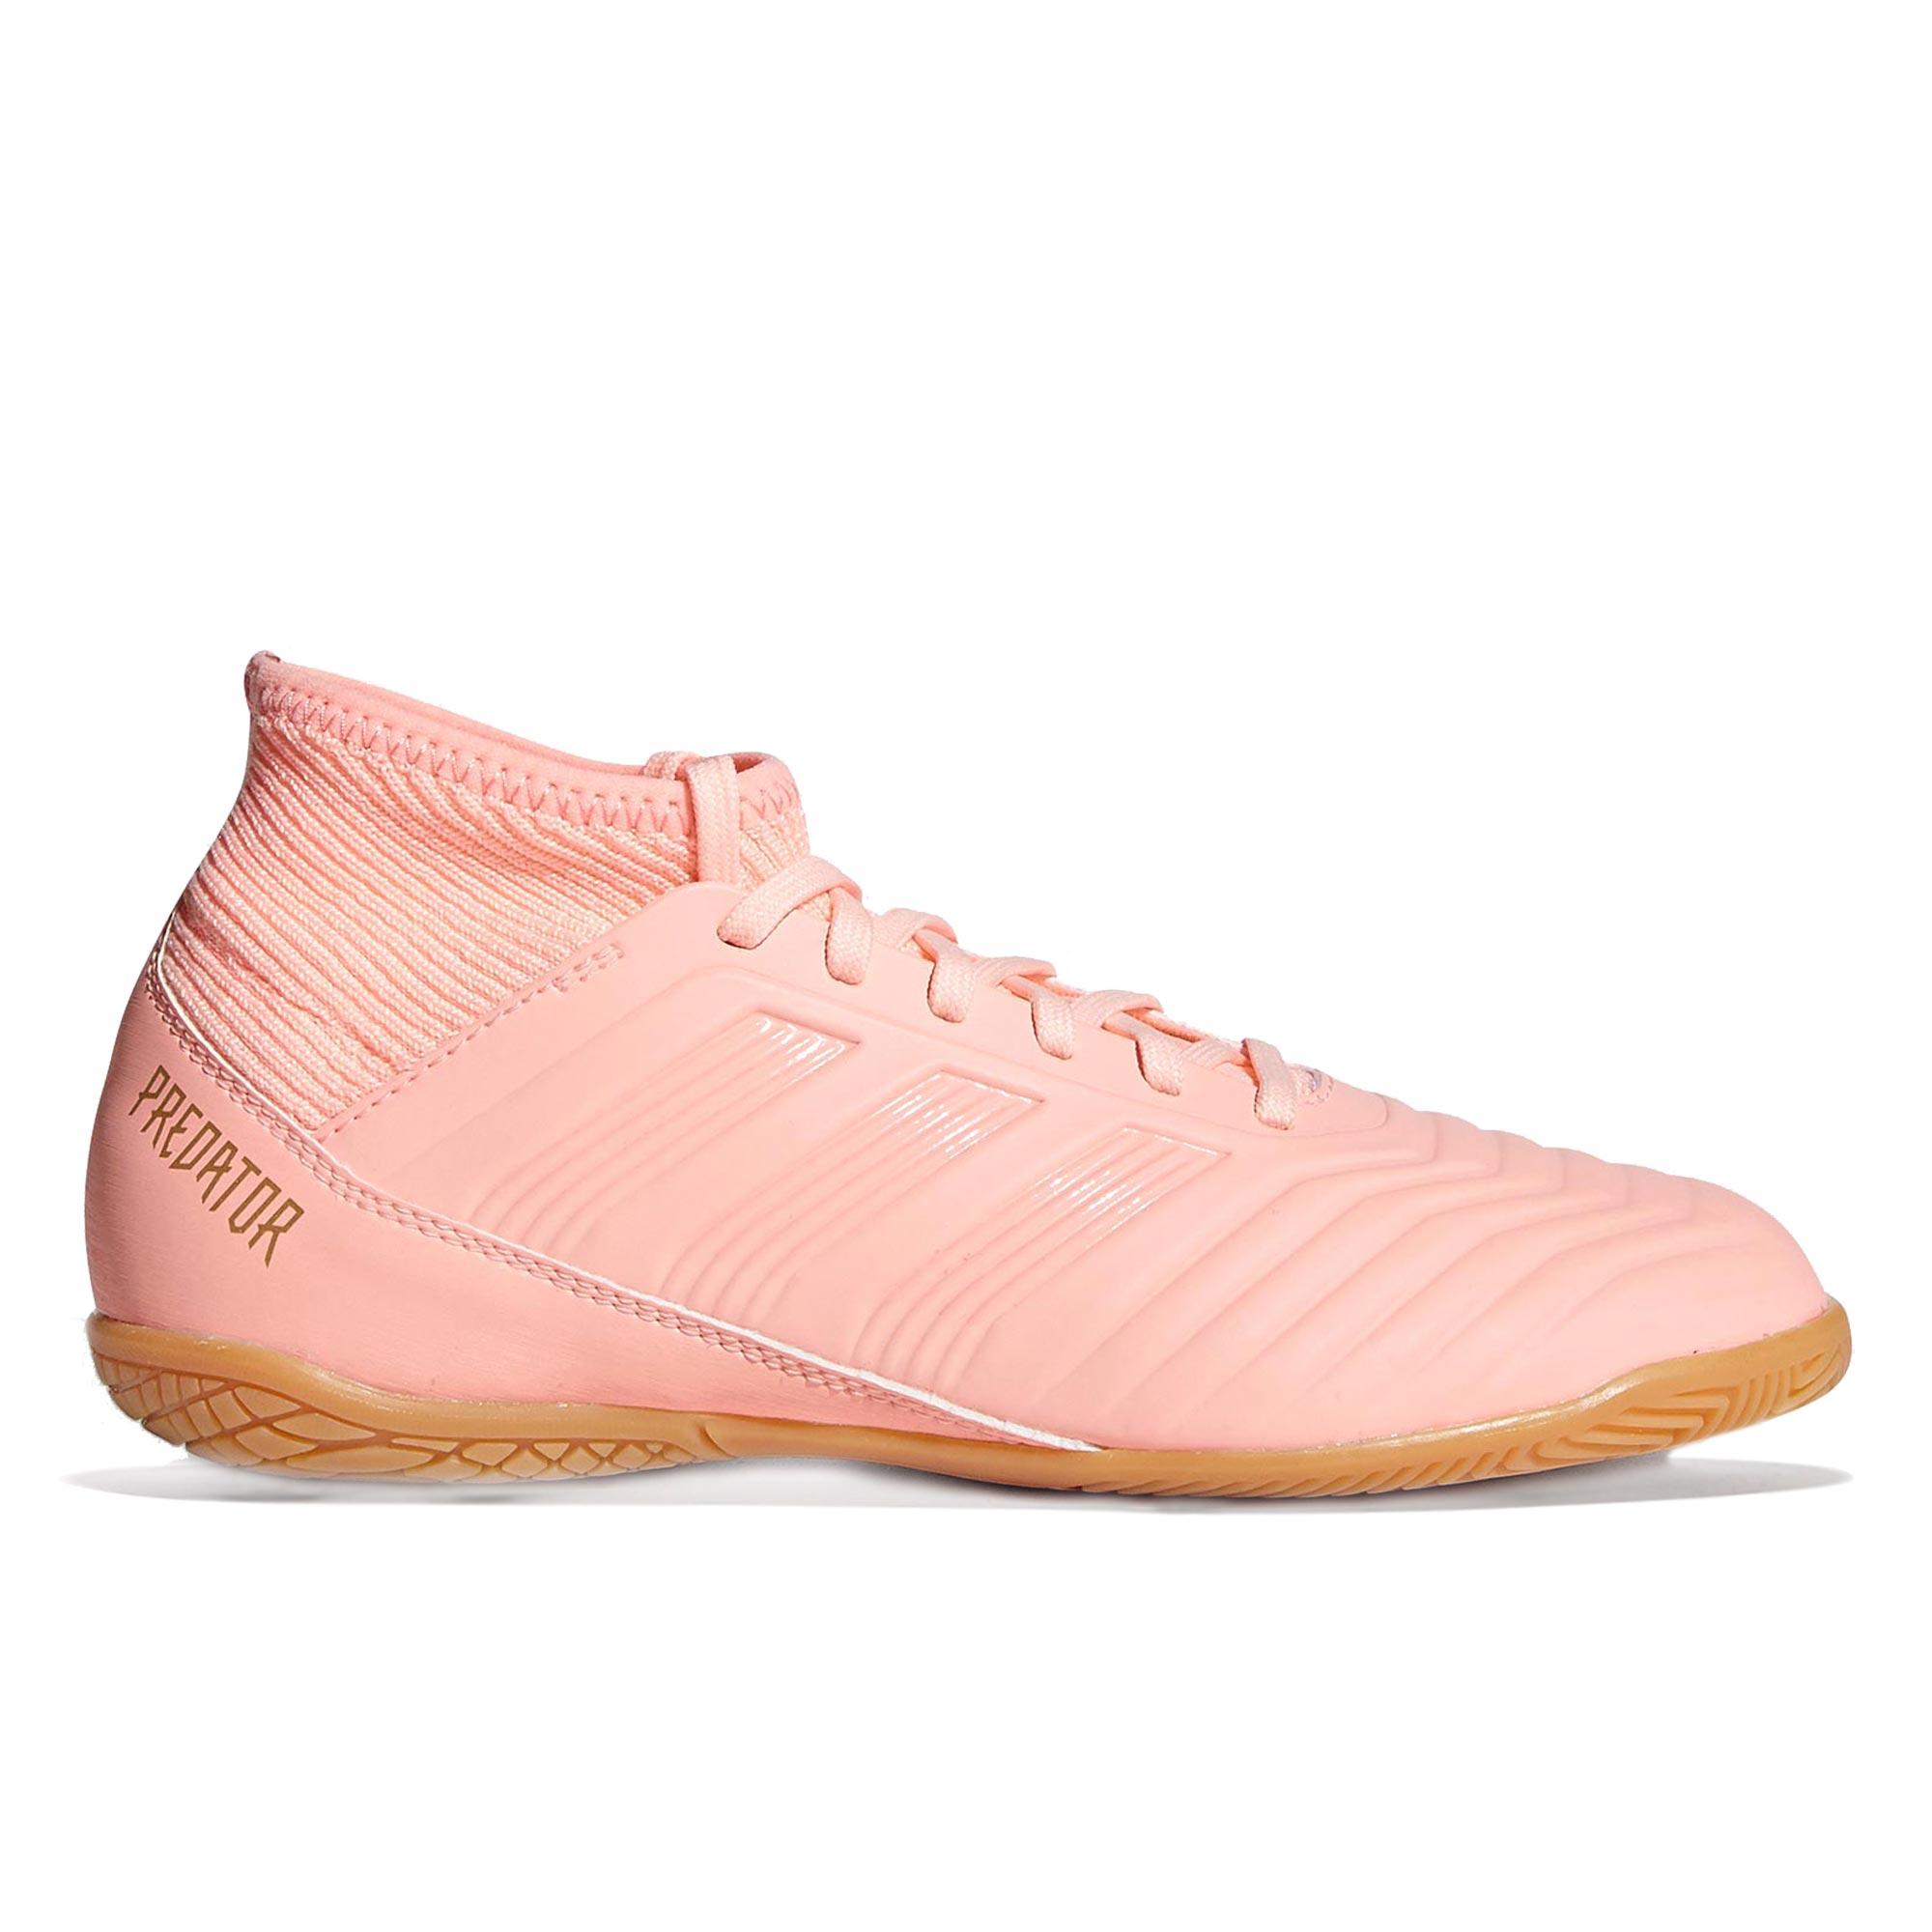 Adidas Predator Tango 18.3 Indoor Trainers - Orange - Kids